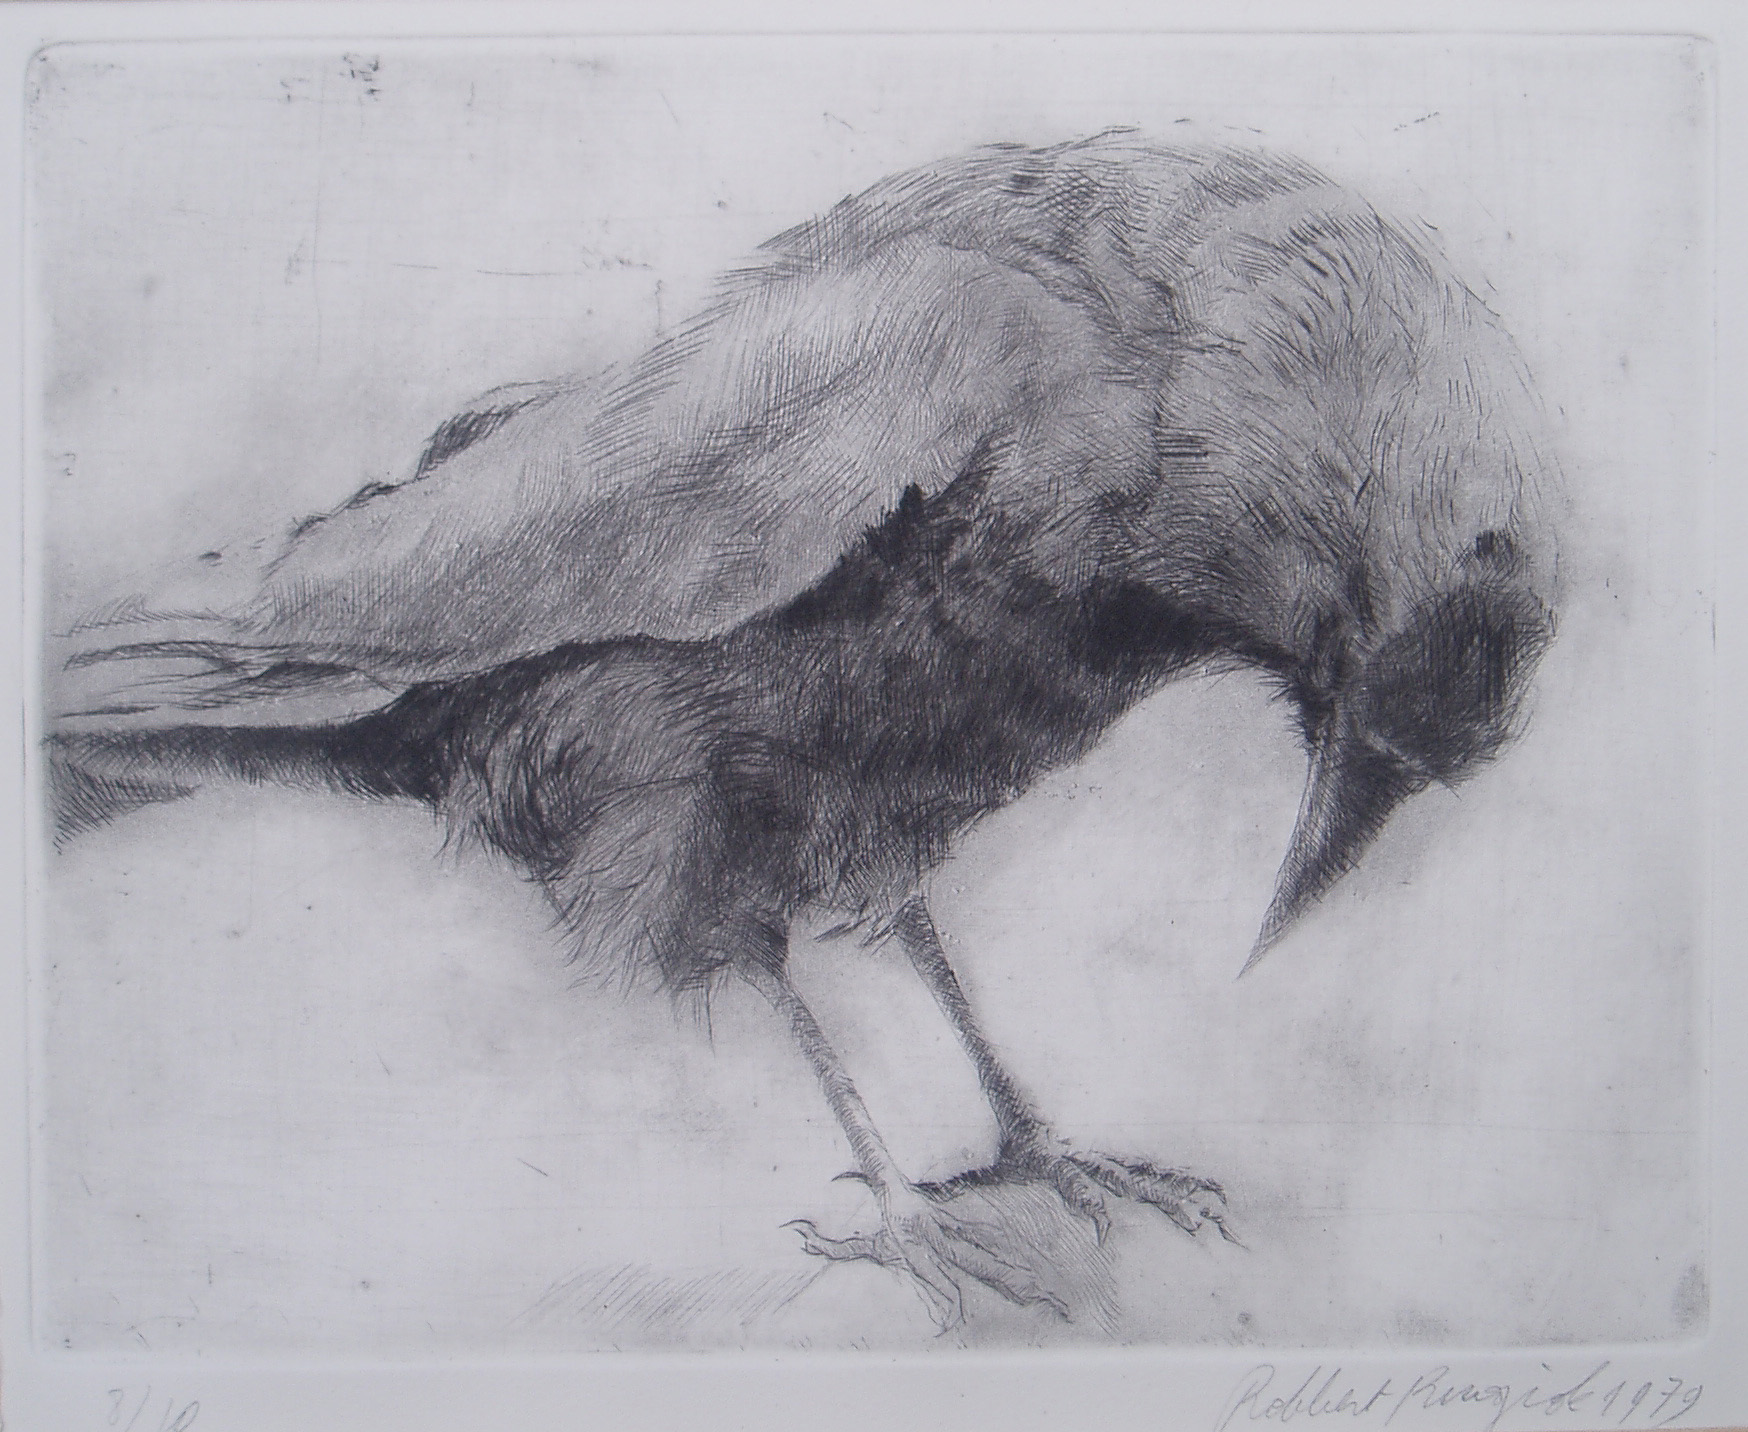 Robbert Ruigrok, 'Crow', 1979. Dry point.